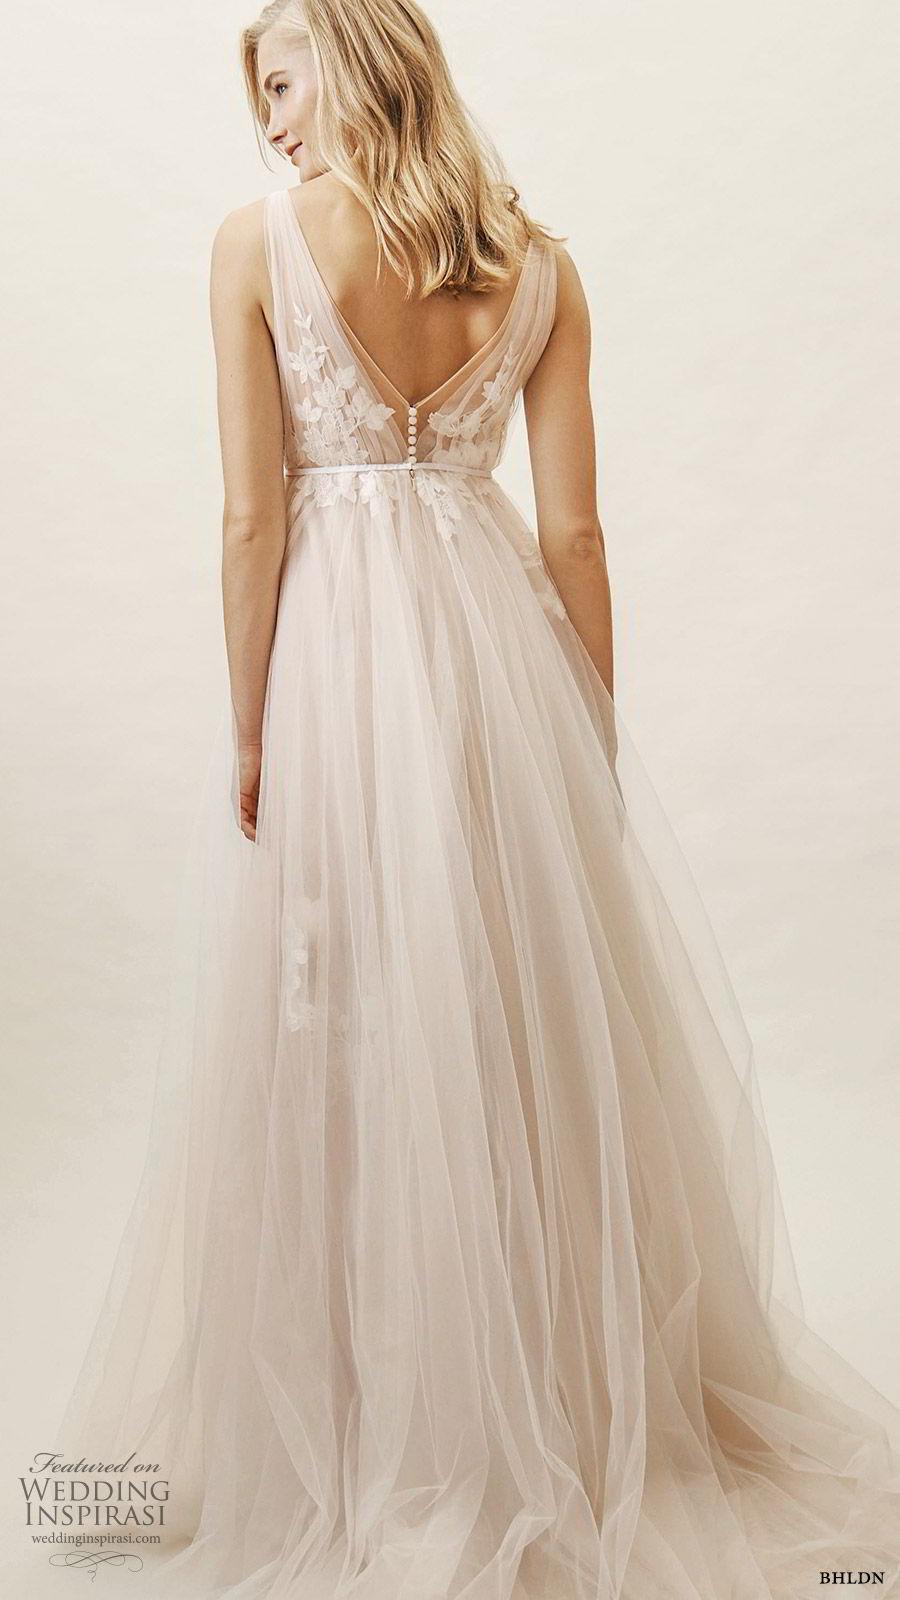 bhldn spring 2019 bridal sleeveless v neckline ruched bodice a line ball gown lace embellished wedding dress blush color (13) bv